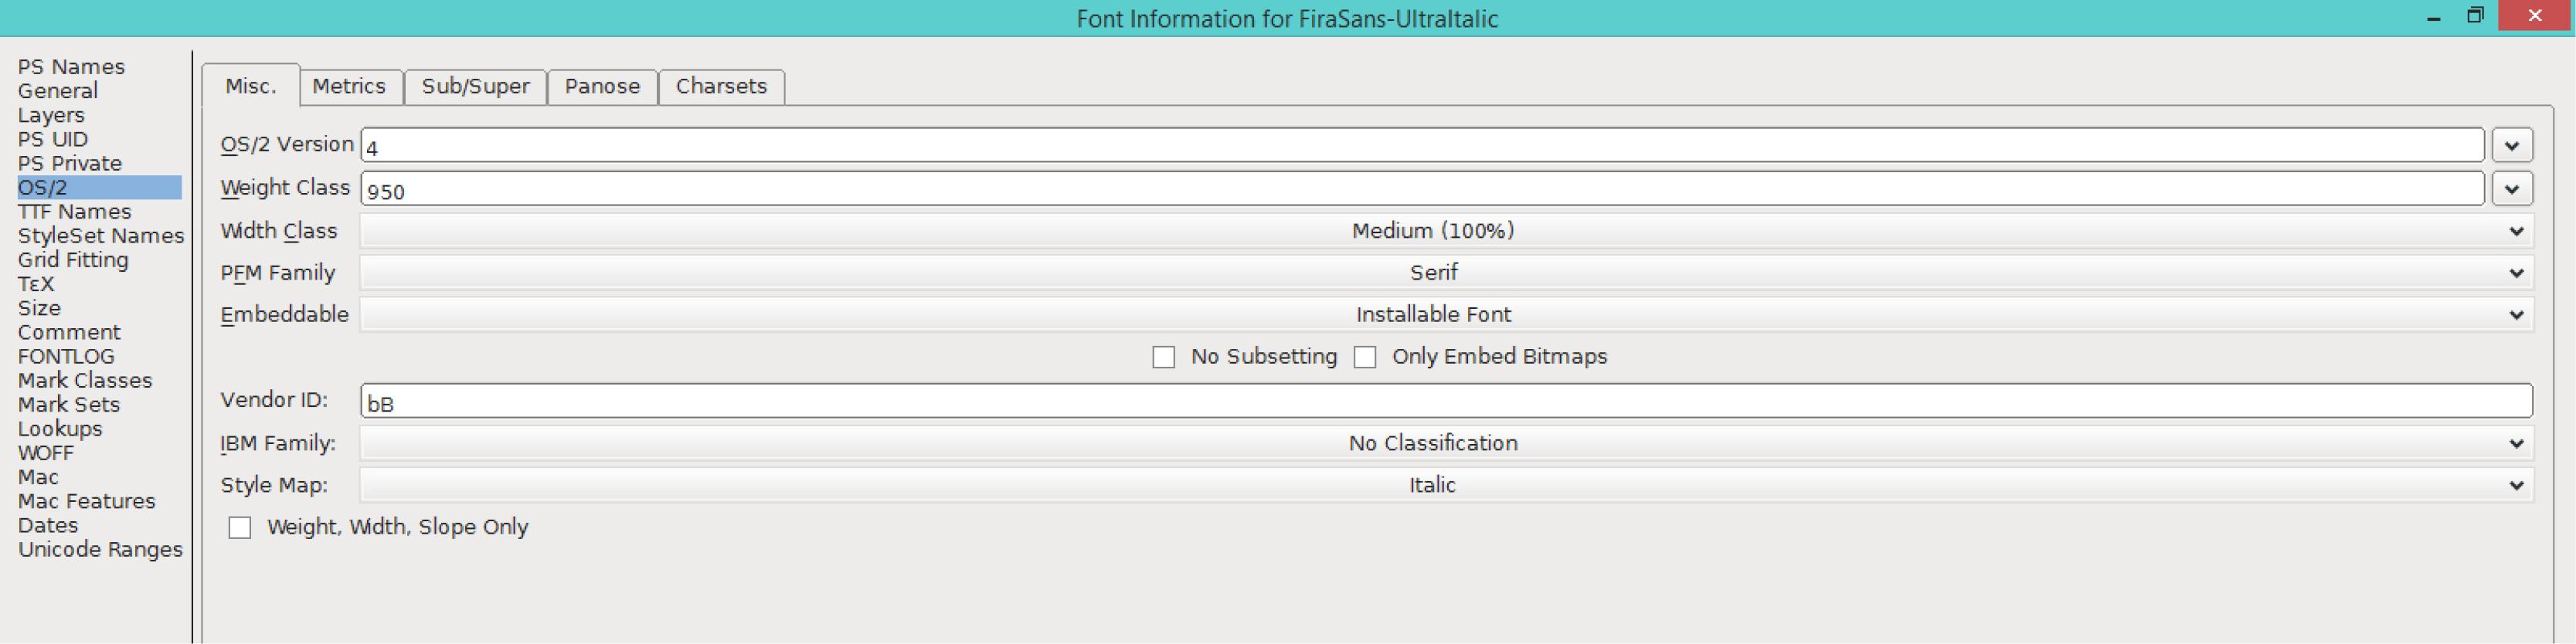 Fira Sans Ultra Italic (OS/2)